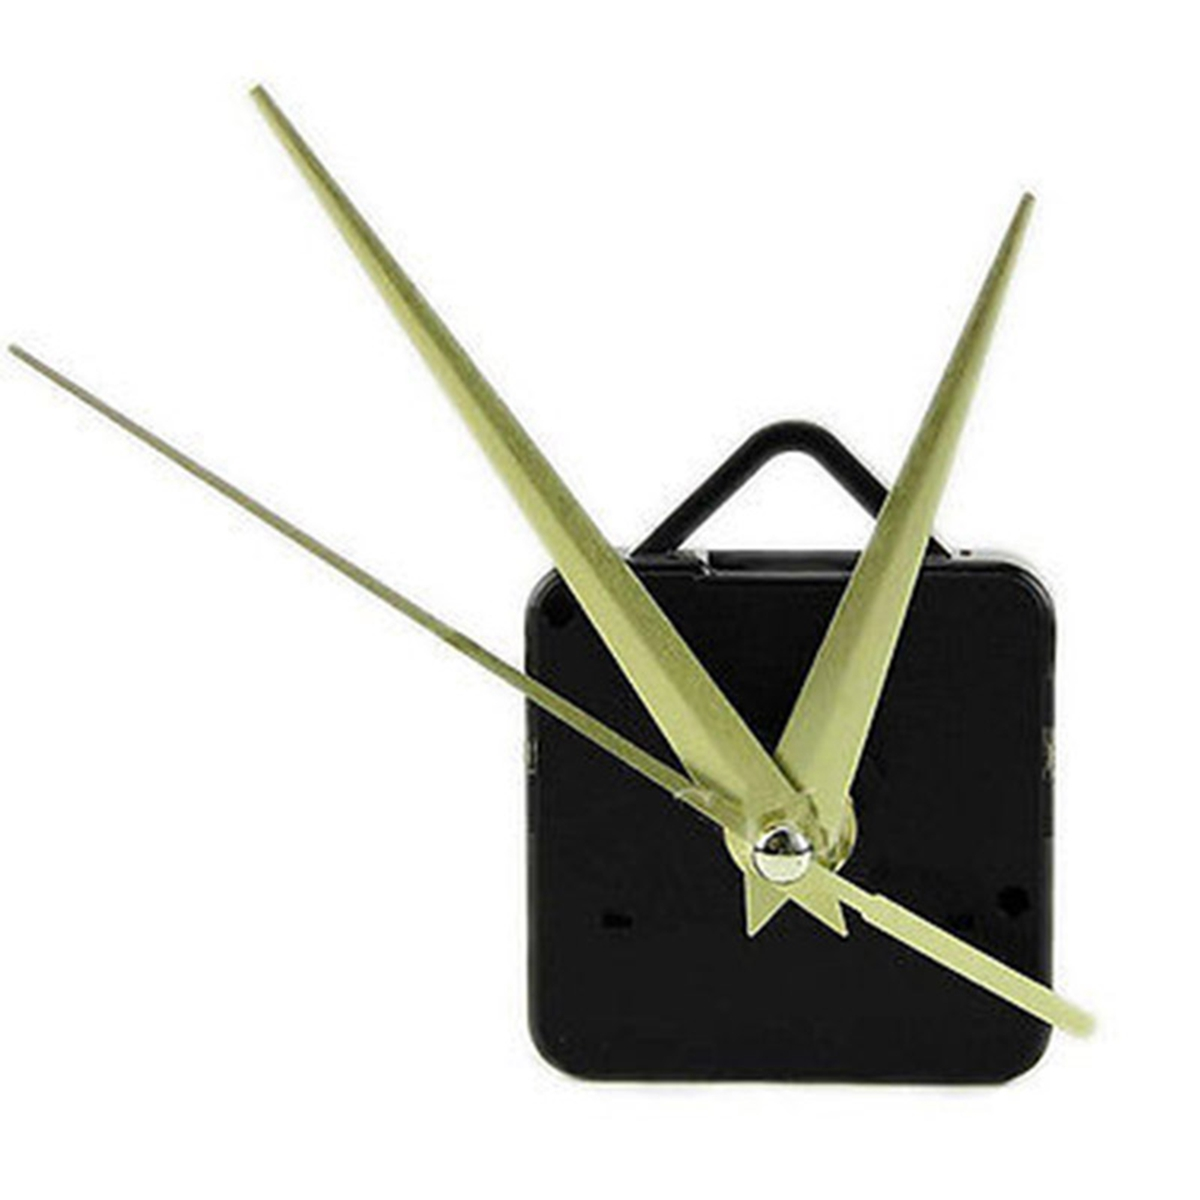 Quartz Wall Movement 22mm Length Black DIY Clock Mechanism Replacement Repair Parts Kit with Hands